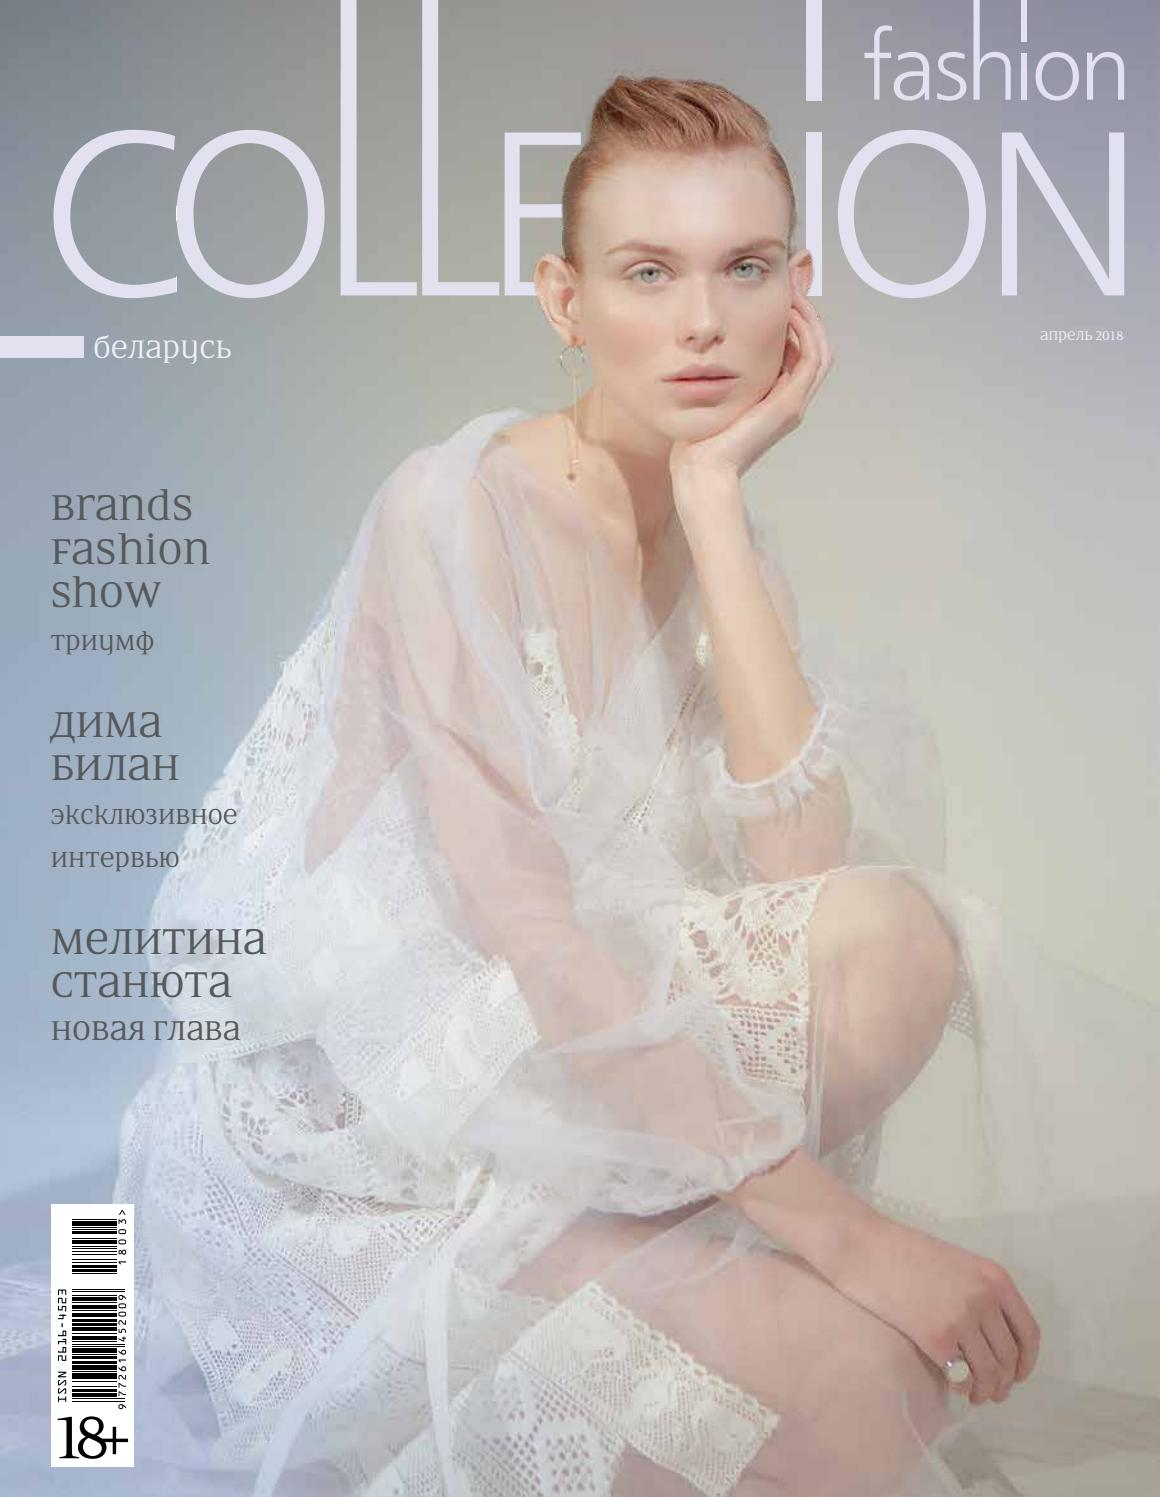 71ecfe6ee372 Fashion Сollection Belarus April 2018 by Fashion Collection Belarus - issuu